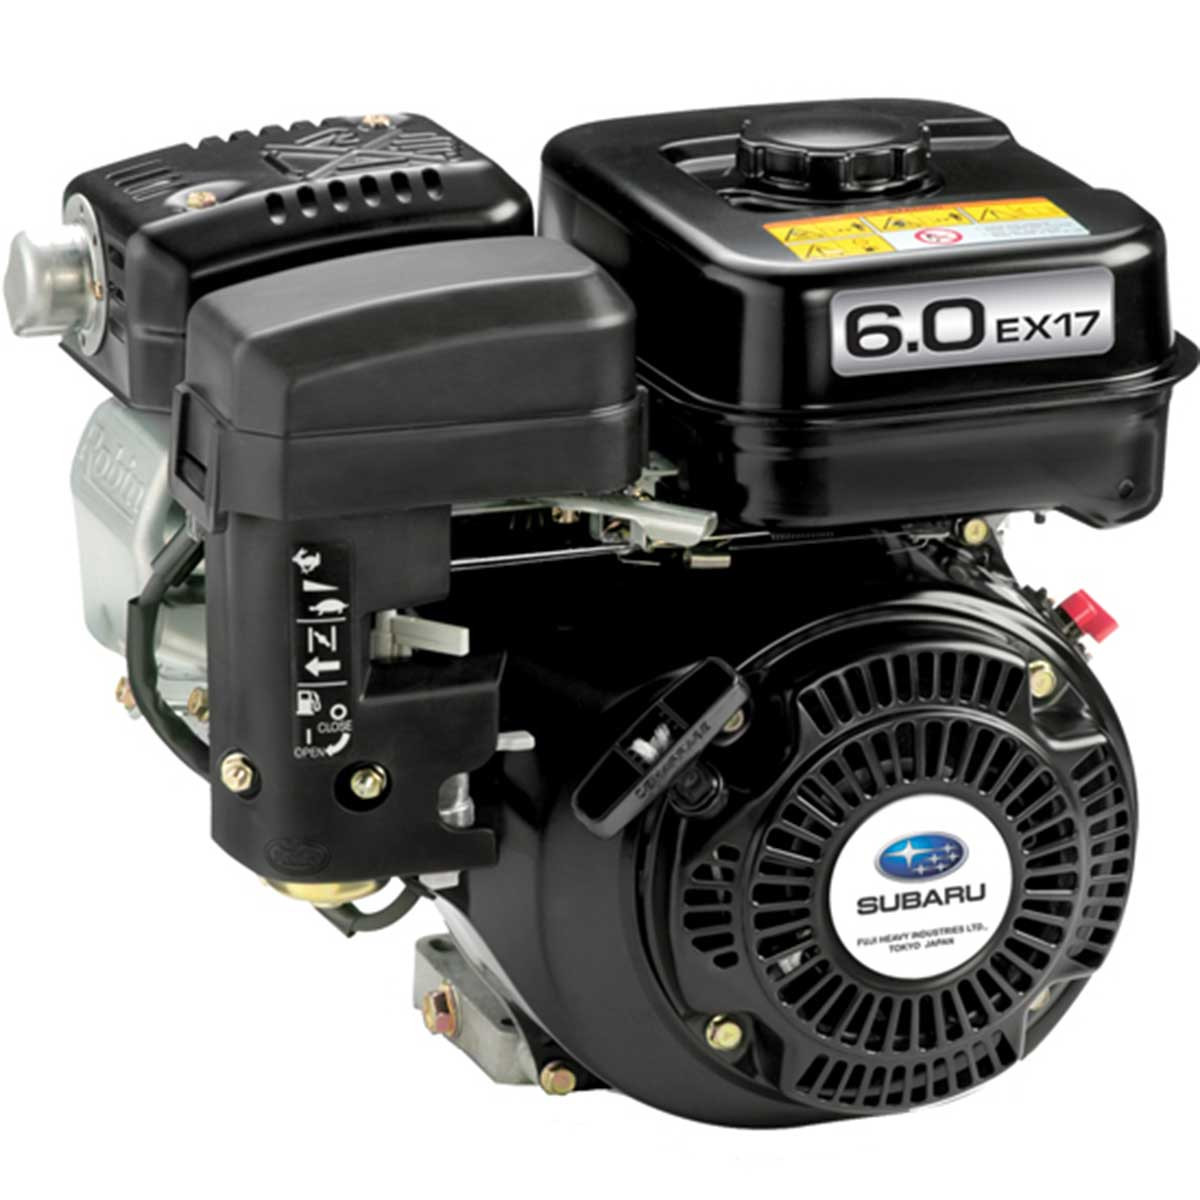 PKX320 291 Gallons Per minute Subaru Centrifugal Water Pump